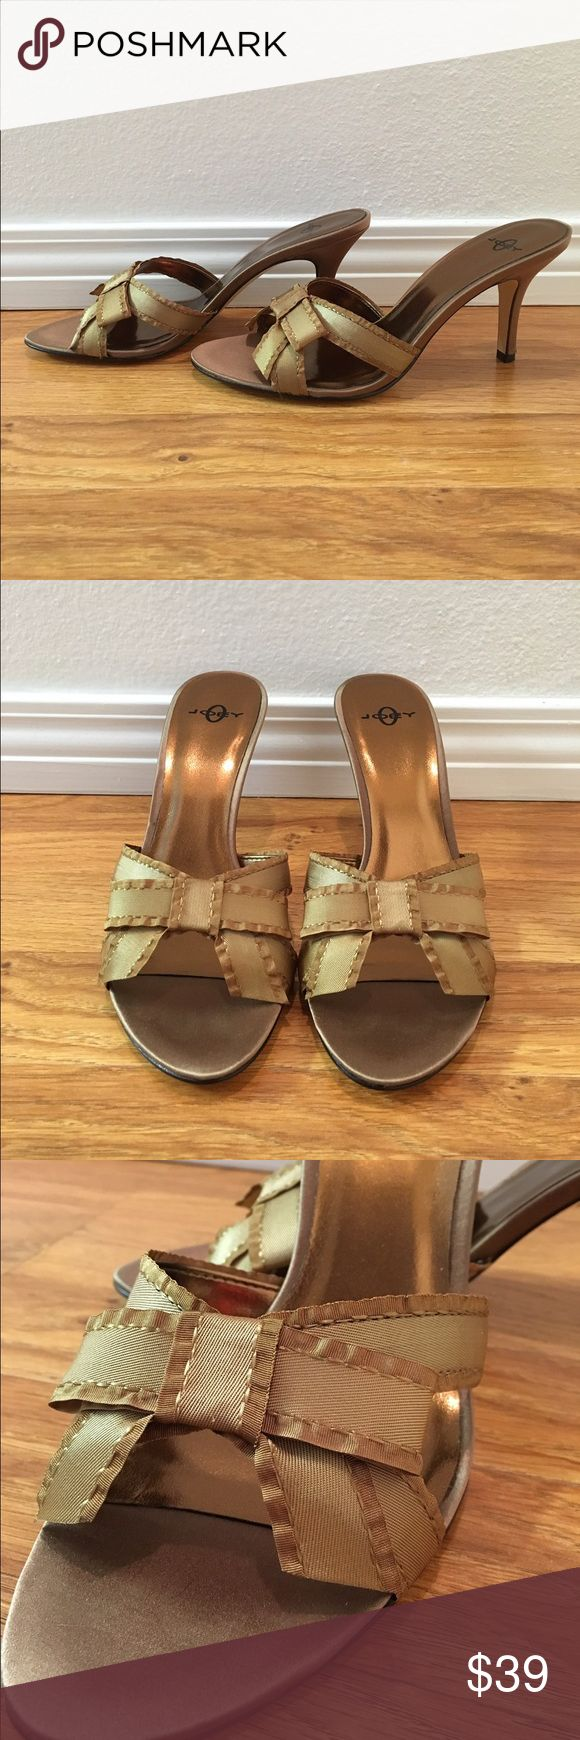 "Joey O Gold Peep Toe Heels Super sassy Joey O gold metallic peep toe slip on heels. Cute front bow detail. 3.5"" heel. ⚡️NO TRADES PLEASE⚡️ Joey O Shoes Heels"